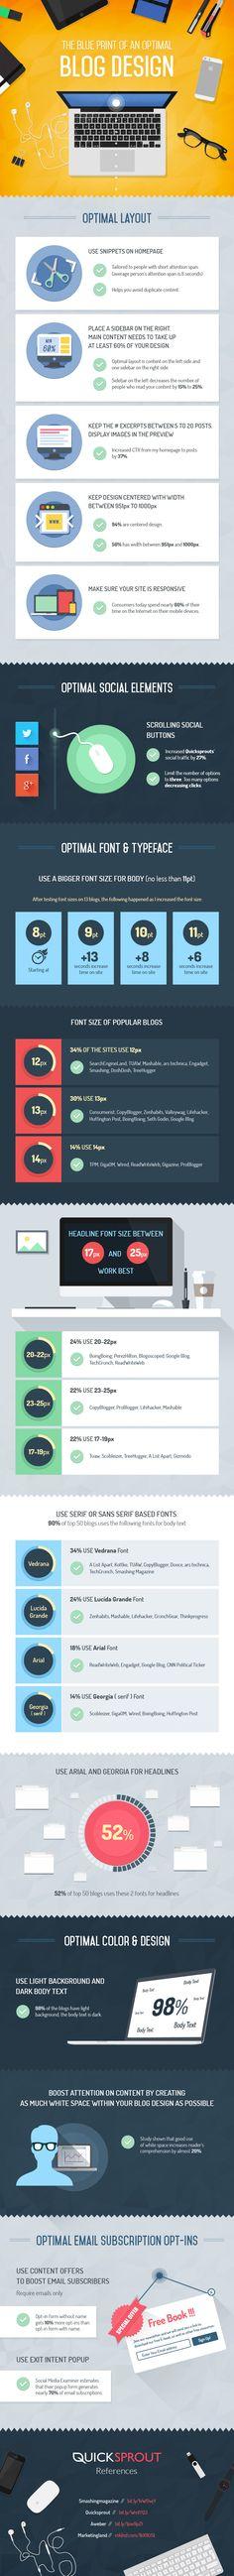 The Blueprint Of An Optimal Blog Design #infographic